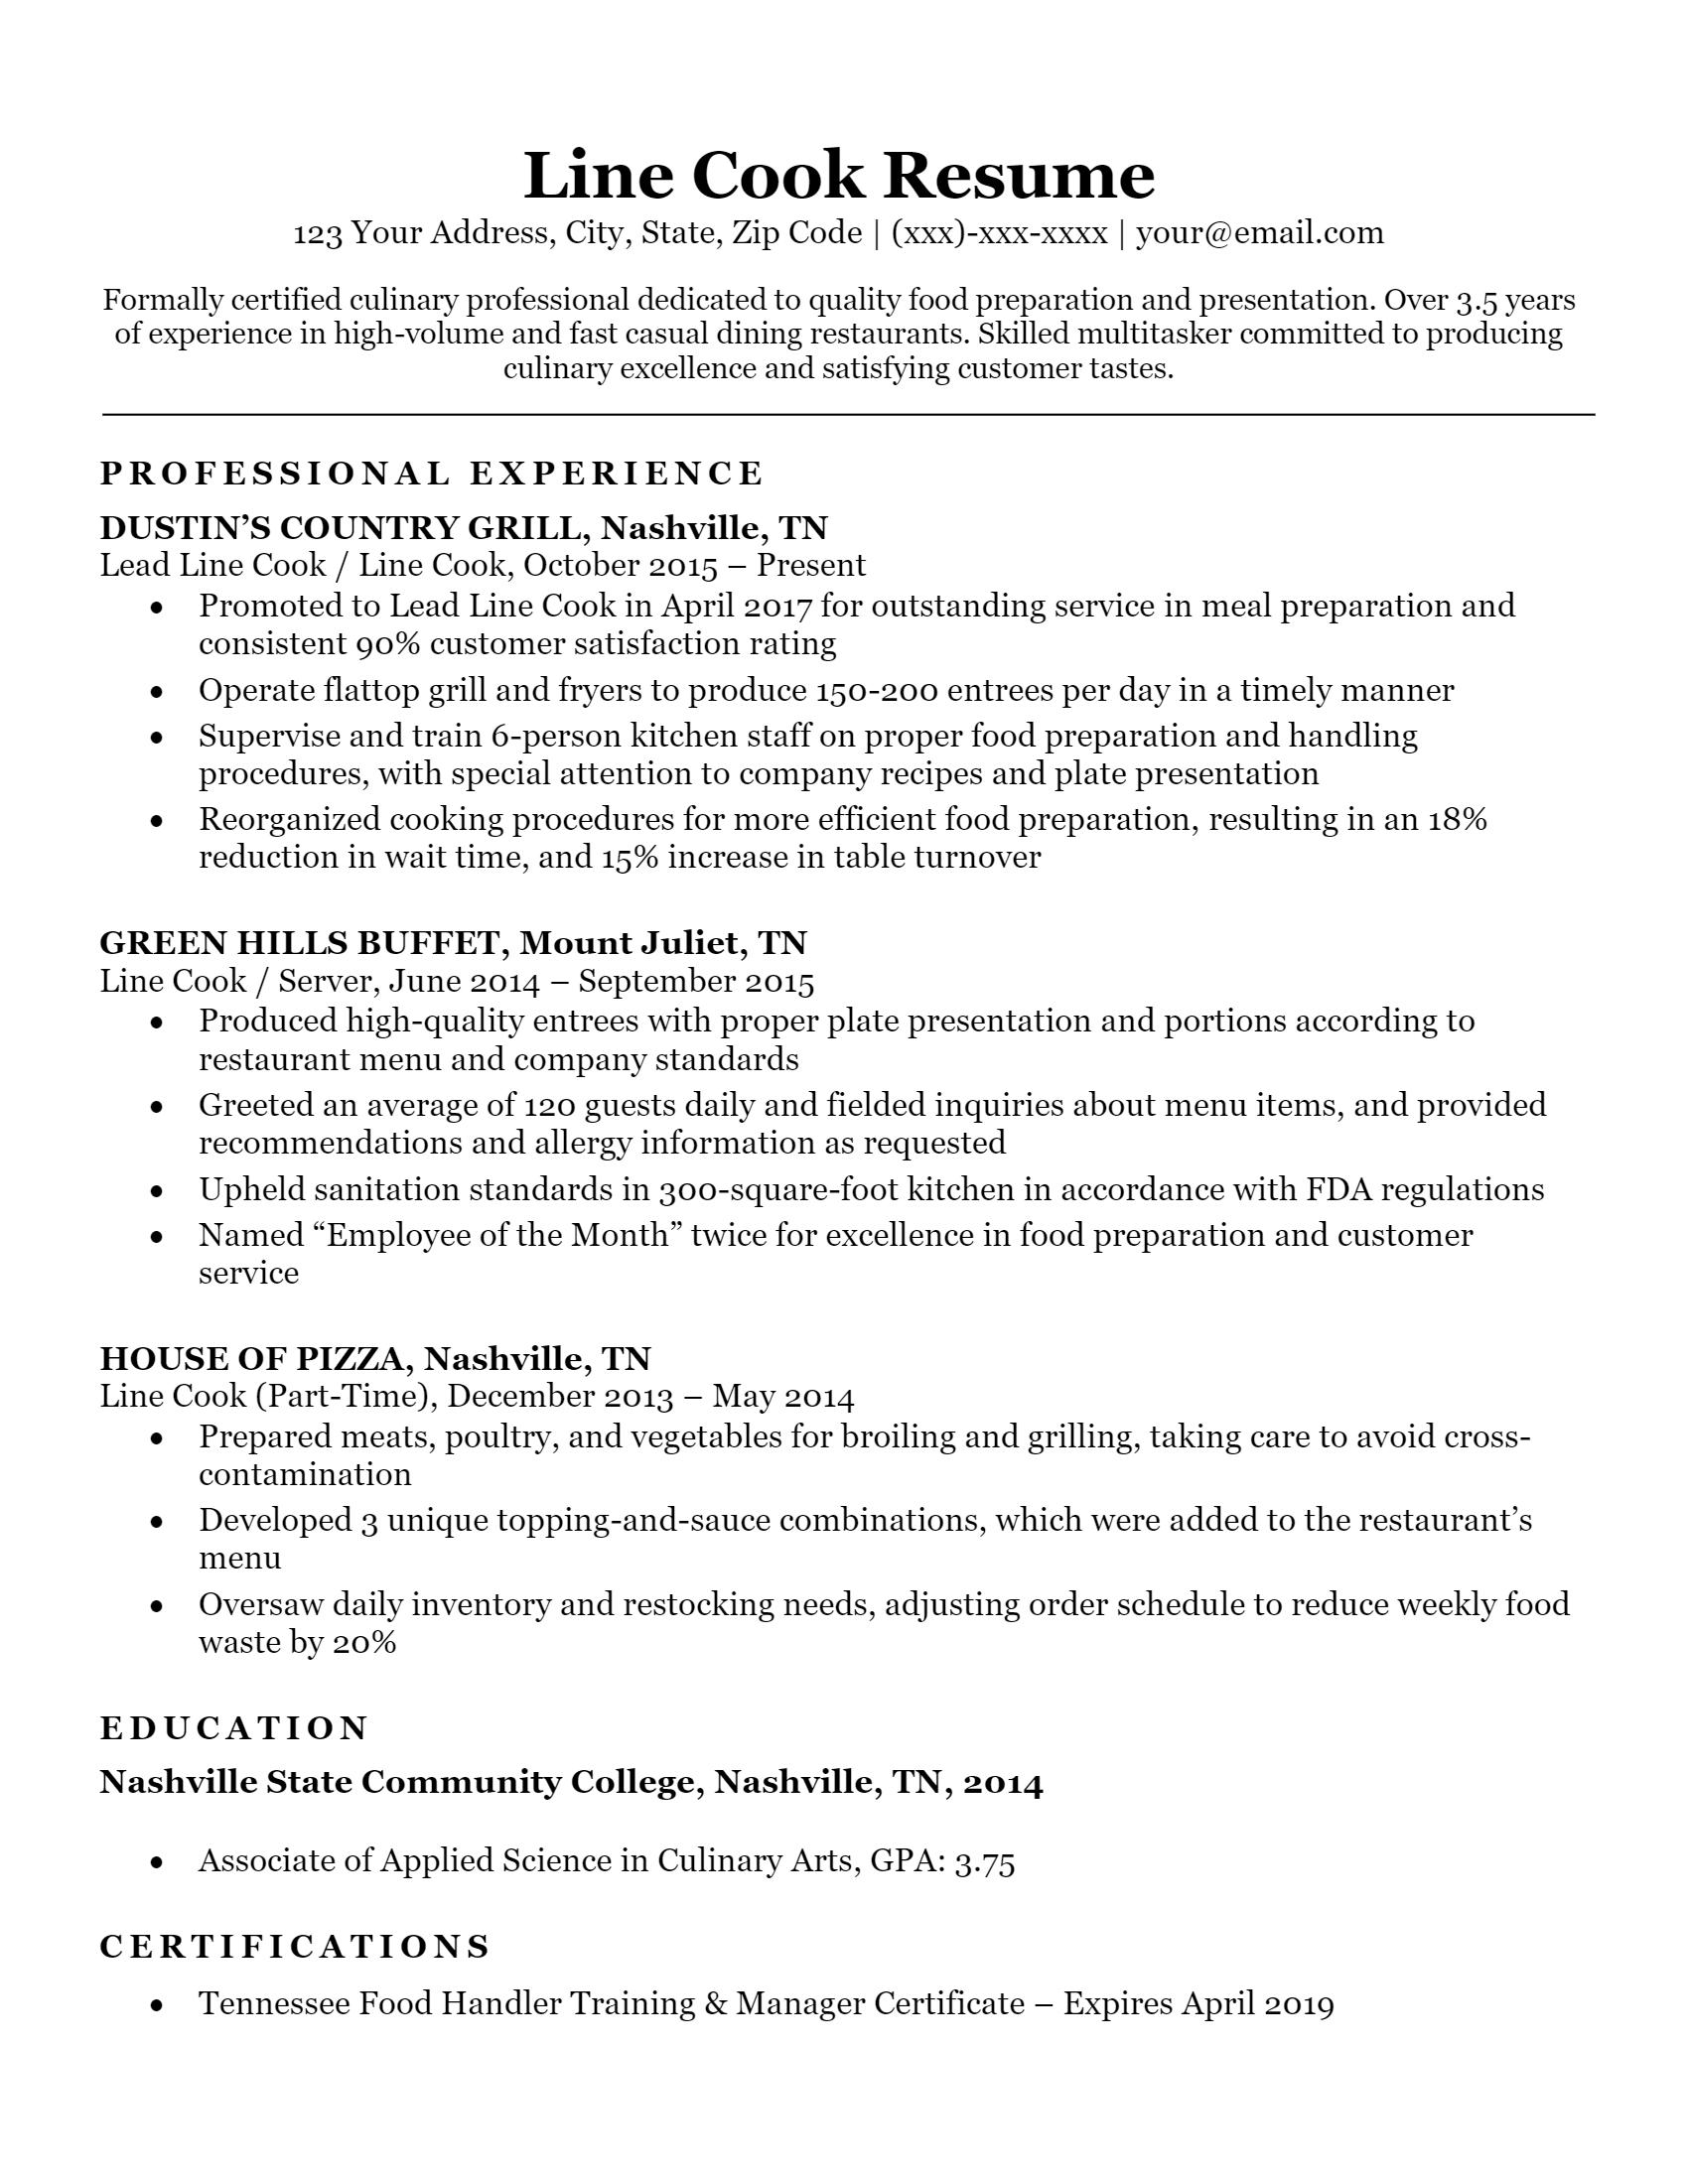 Line Cook Resume > Line Cook Resume .Docx (Word)